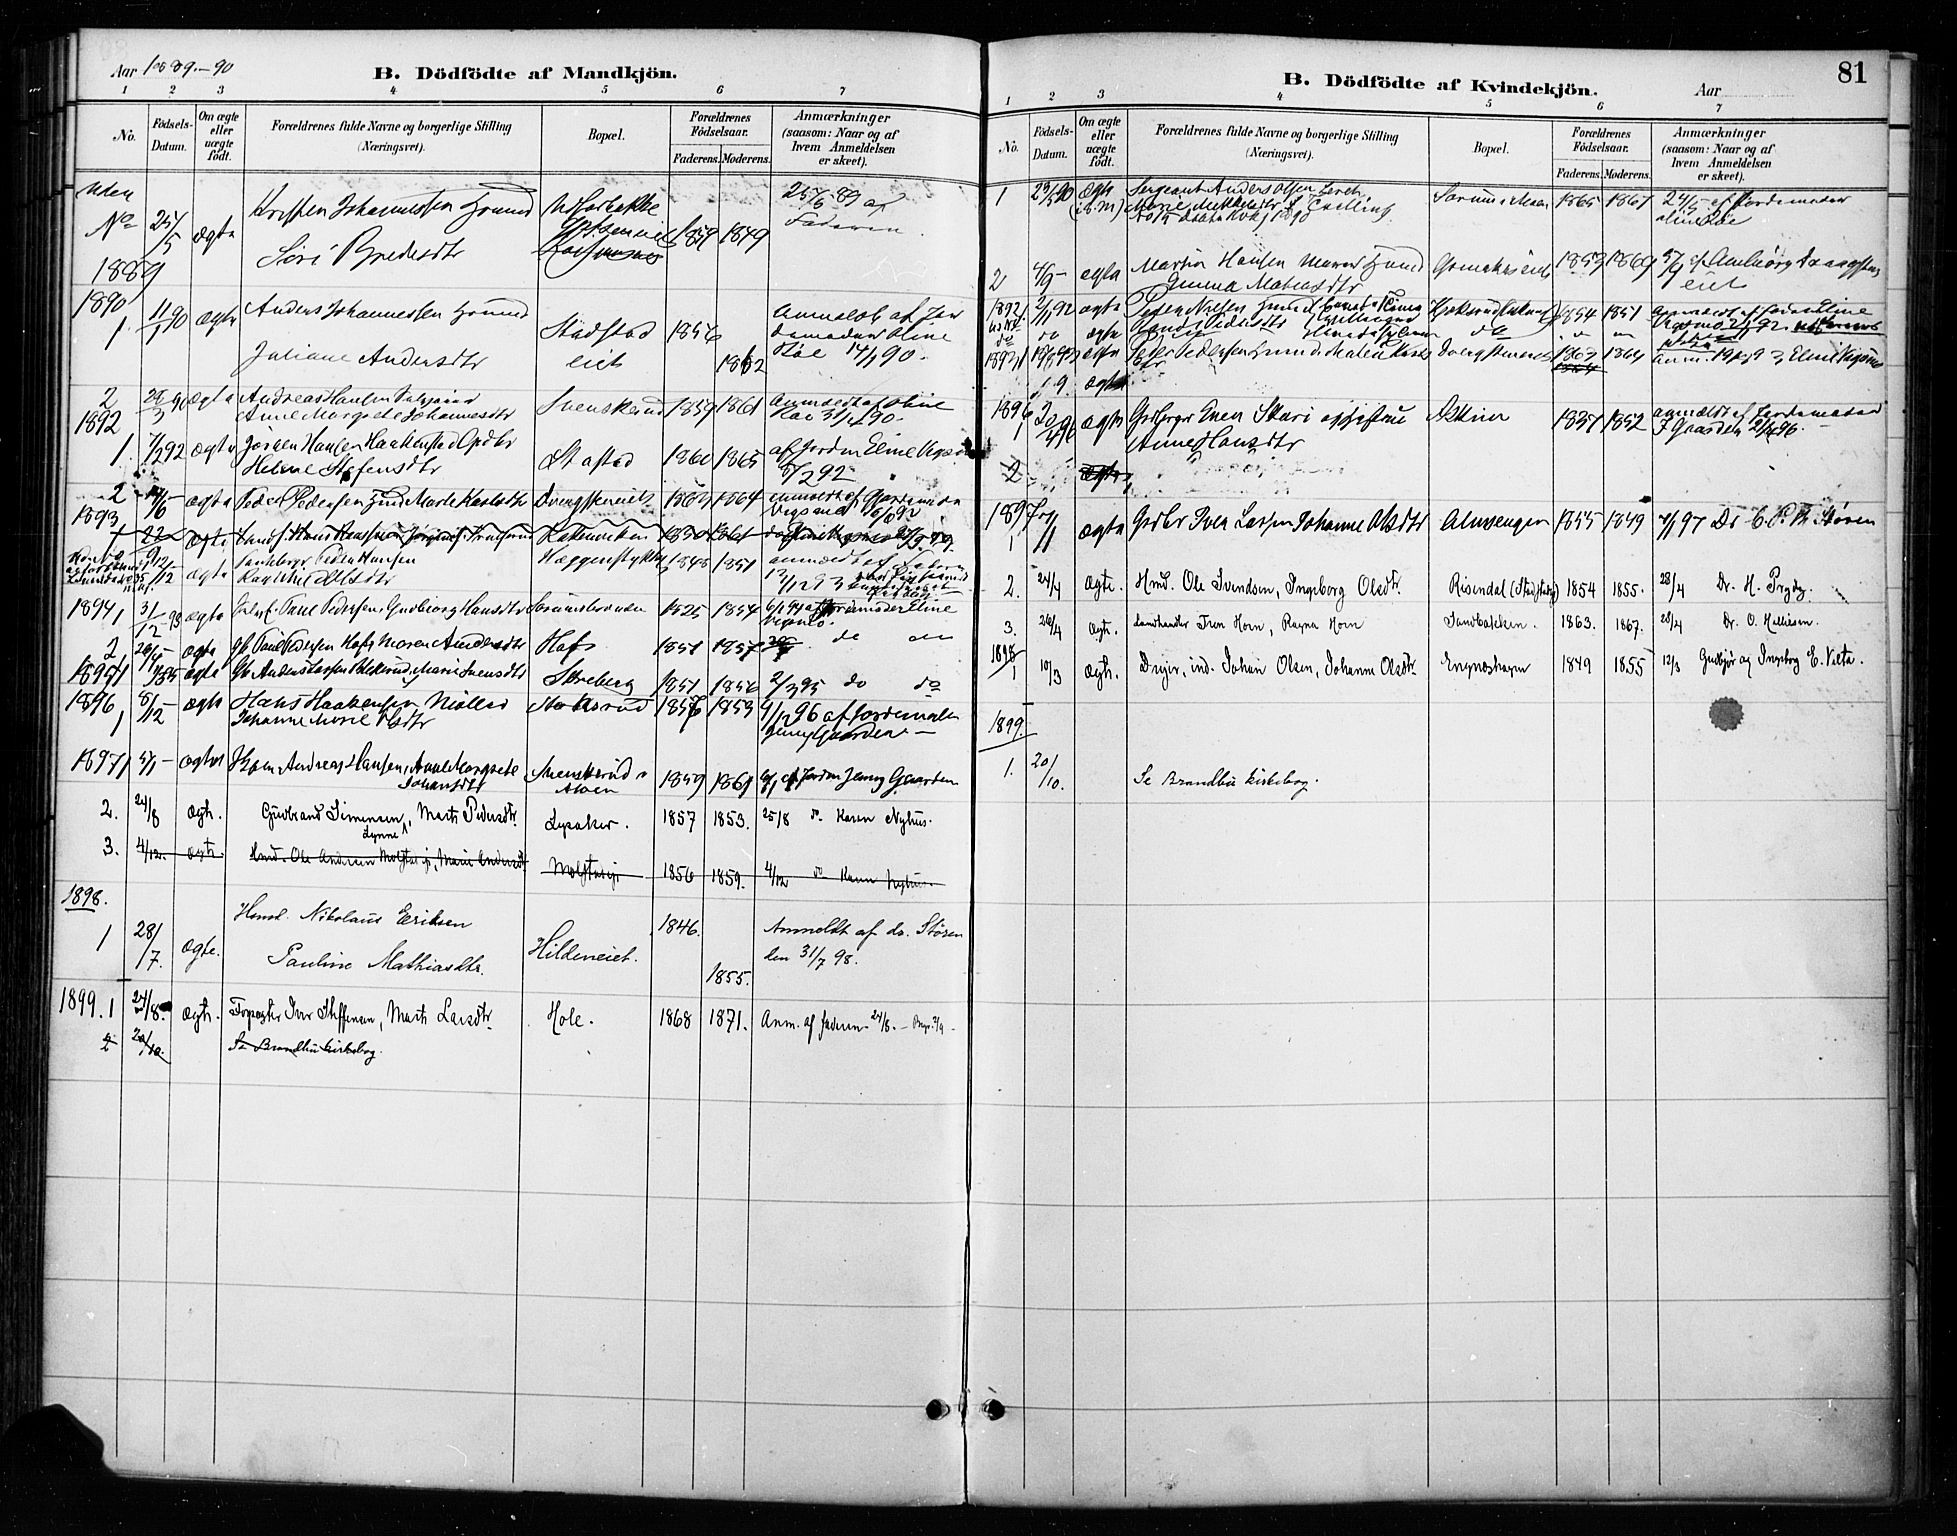 SAH, Gran prestekontor, Parish register (official) no. 18, 1889-1899, p. 81